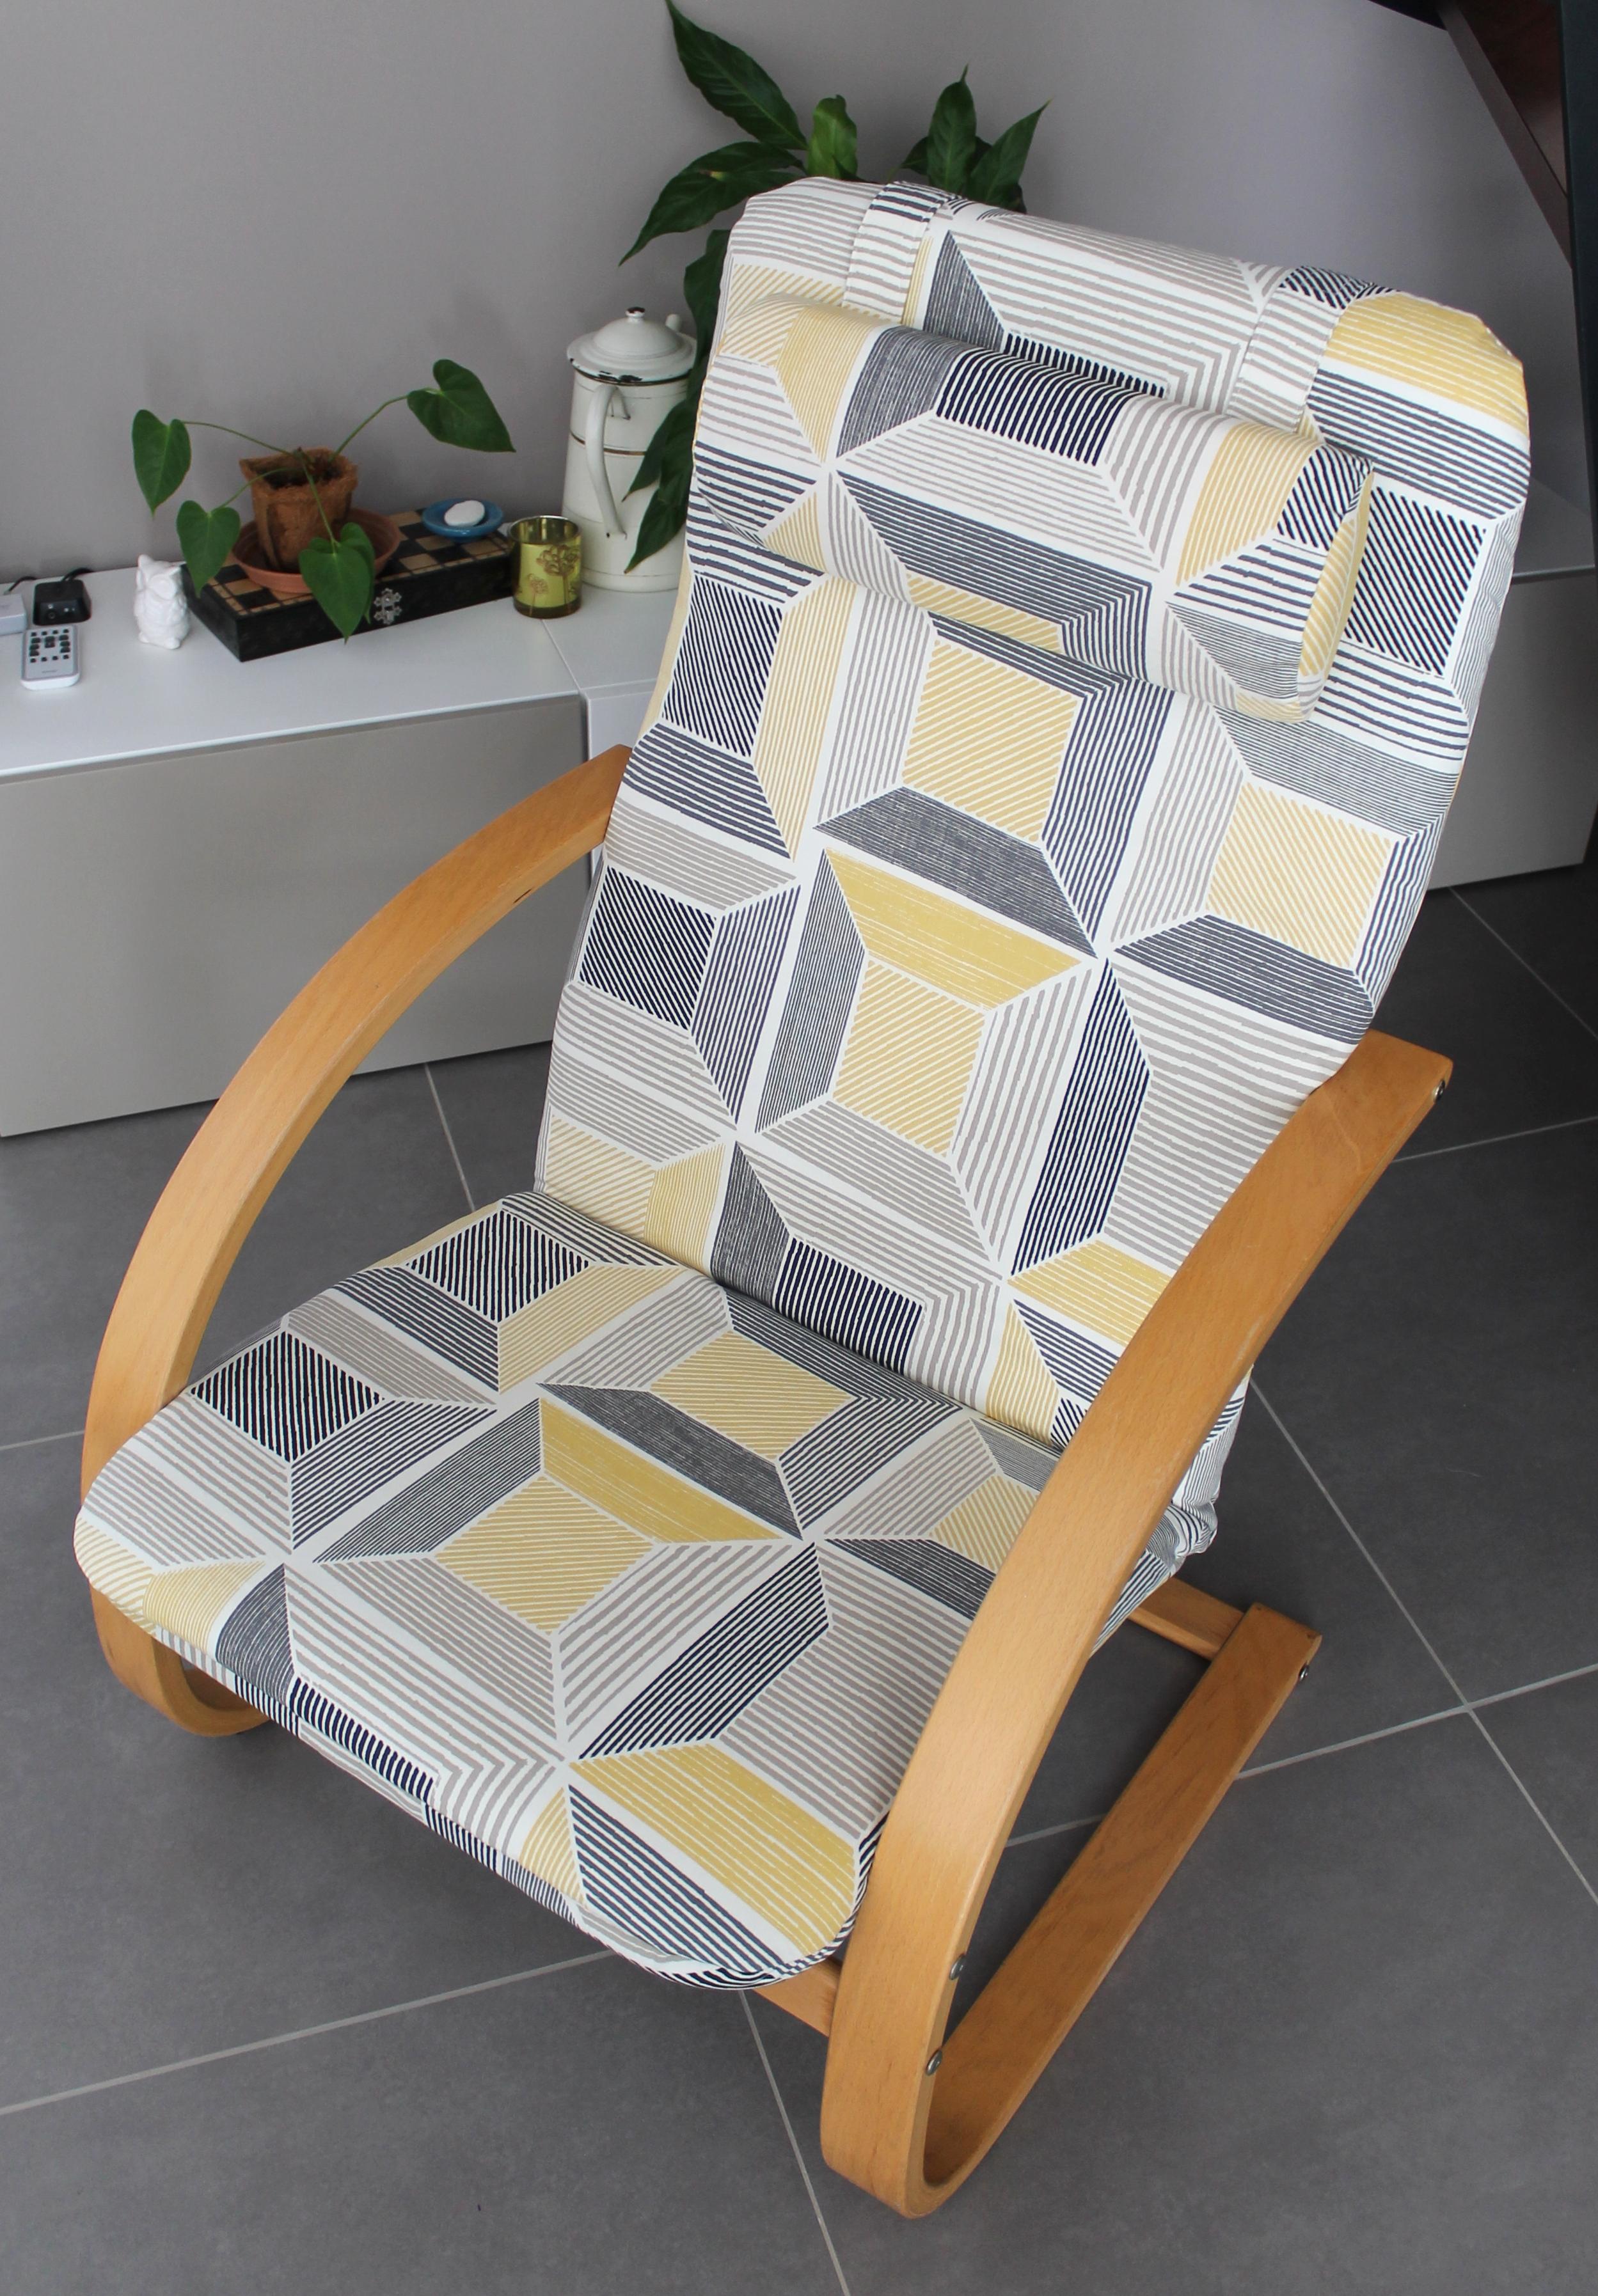 relooking fauteuil po ng la souris cr ative. Black Bedroom Furniture Sets. Home Design Ideas